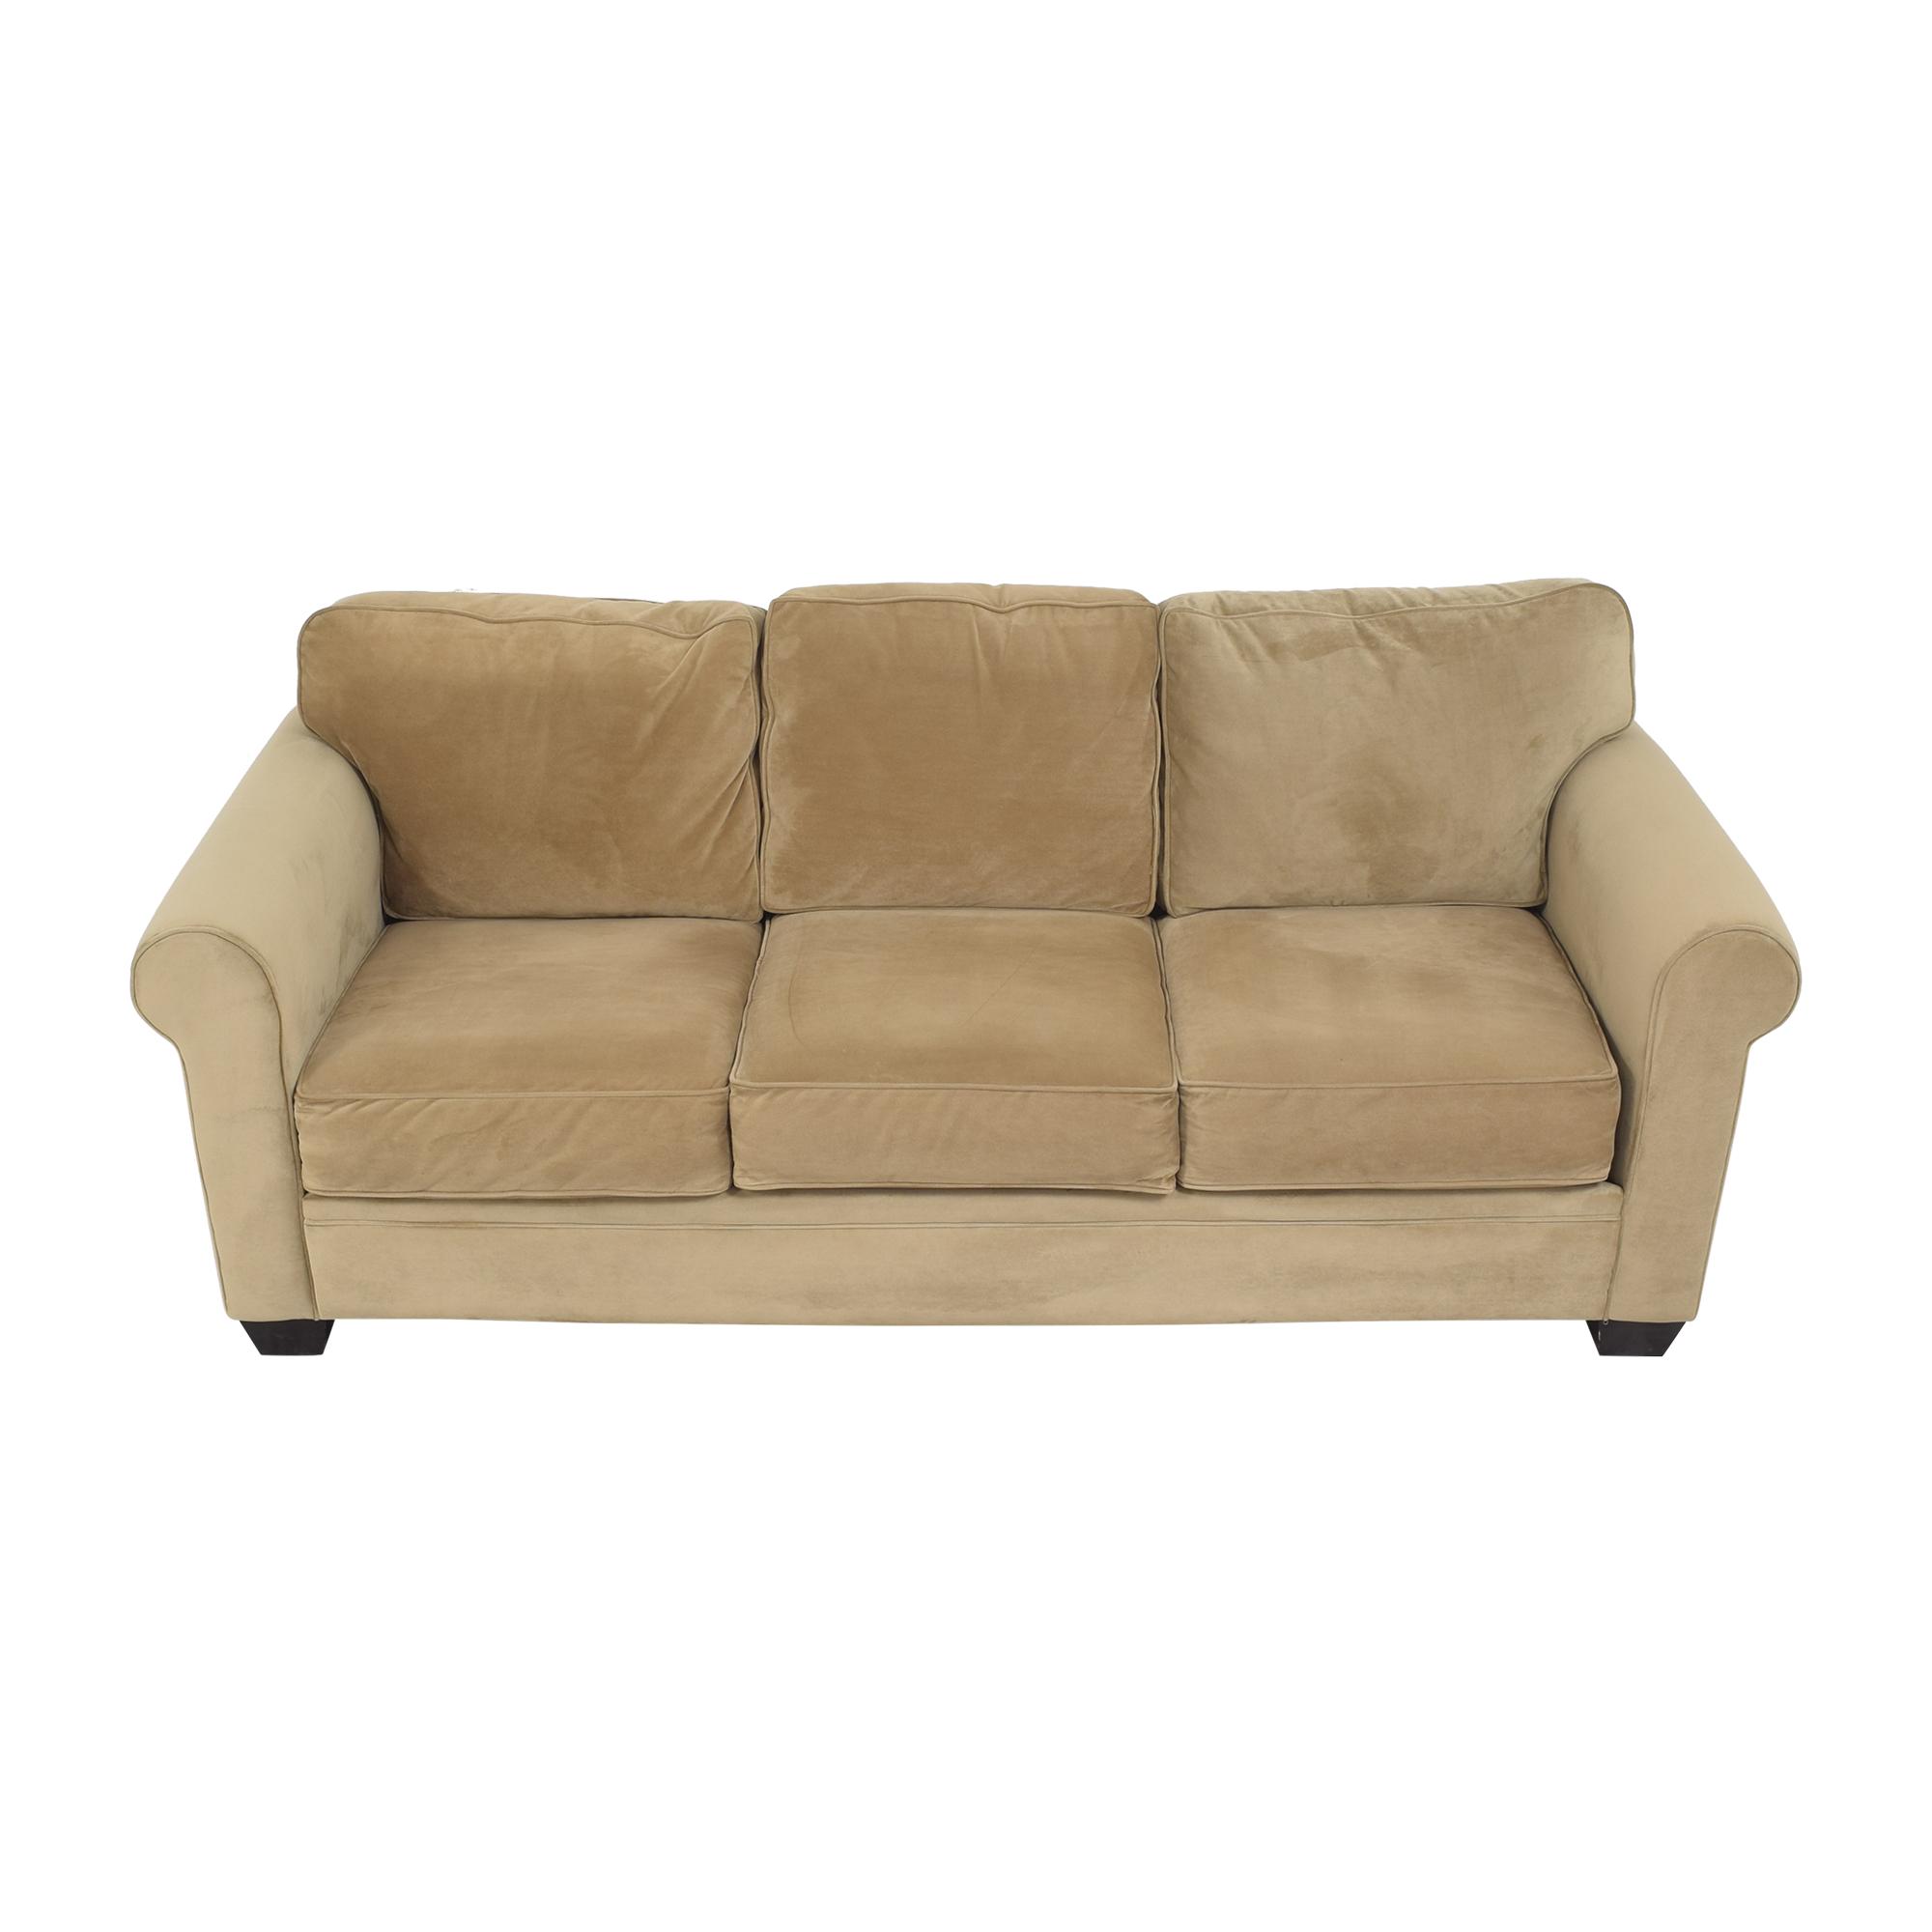 buy Macy's Roll Arm Sofa Macy's Sofas